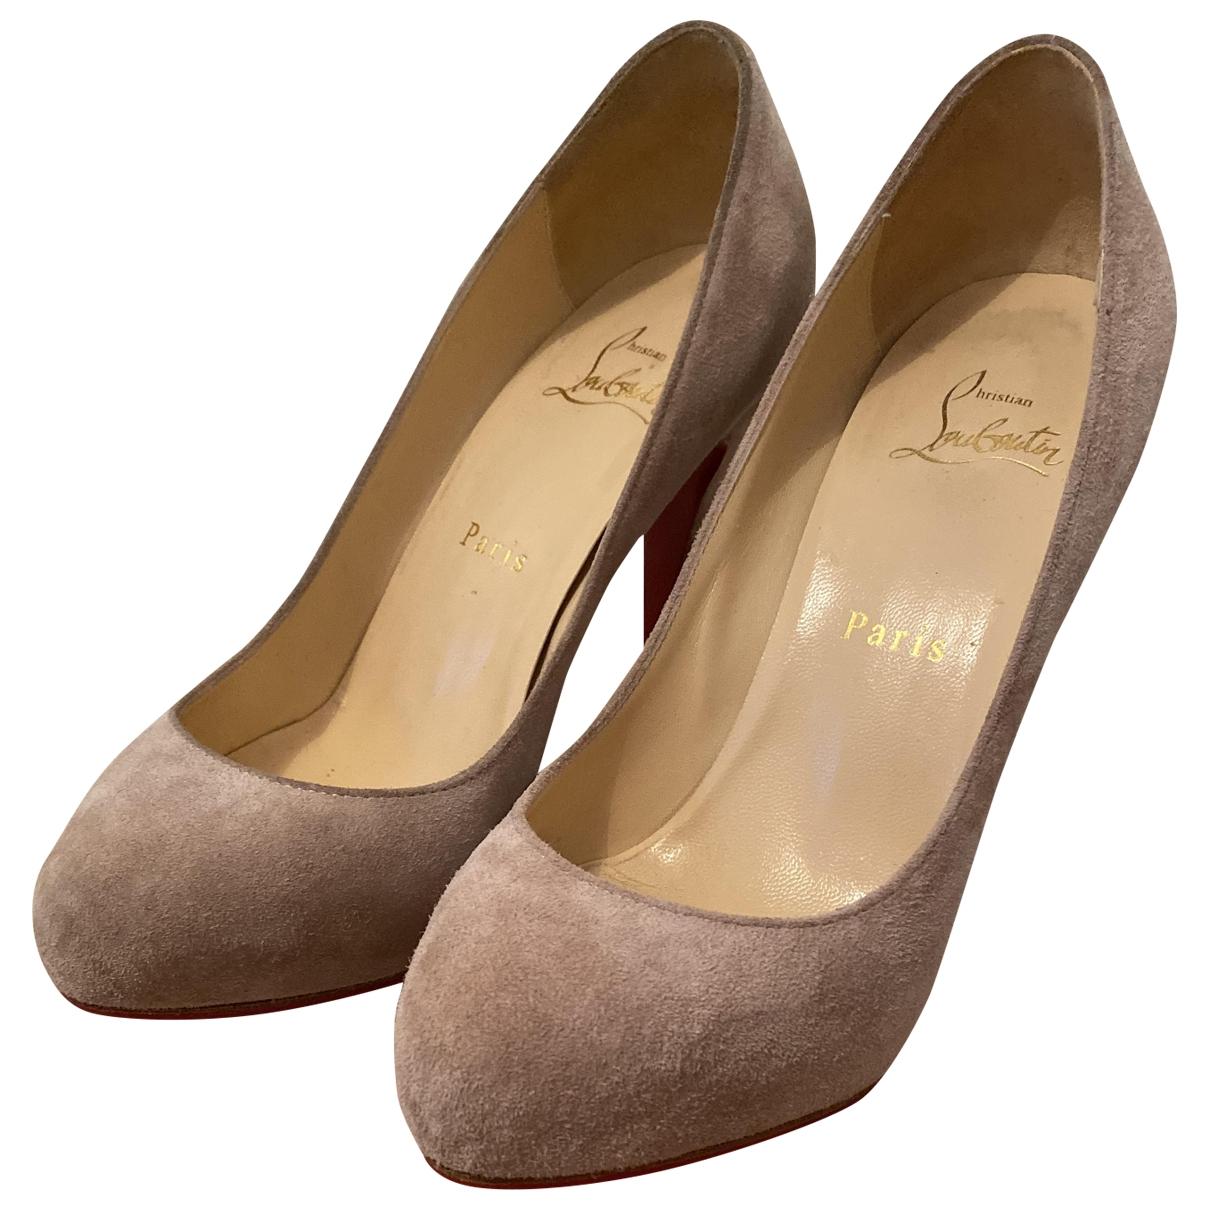 Christian Louboutin \N Beige Pony-style calfskin Heels for Women 36.5 EU